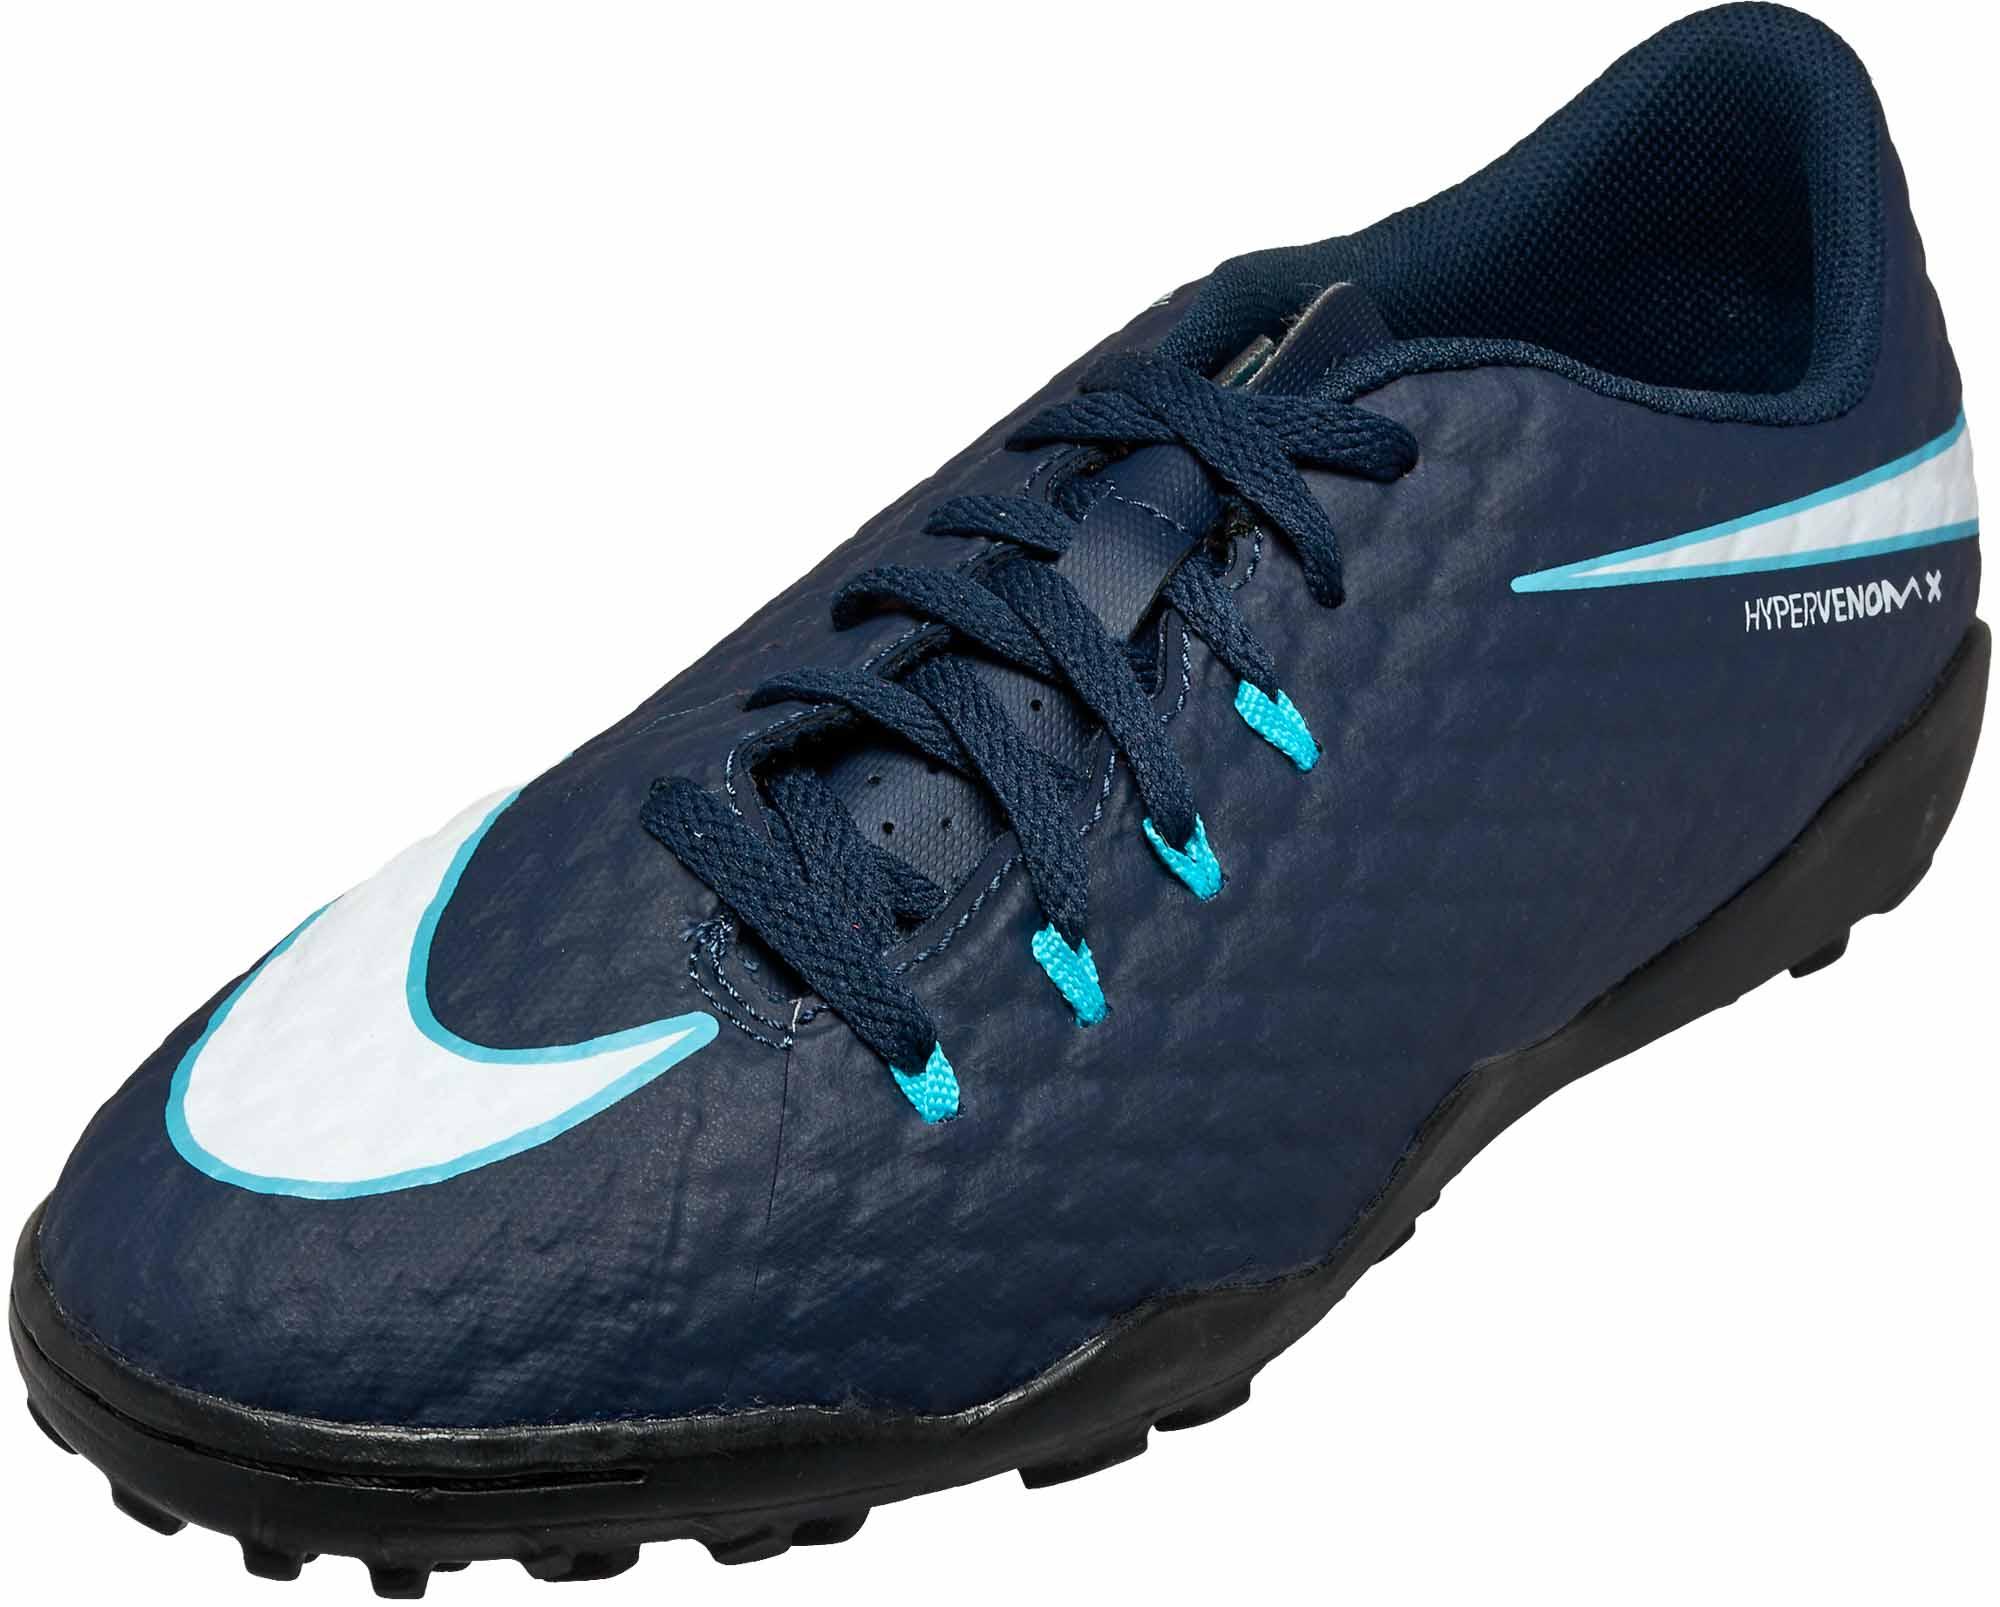 f6329b941ae06 Nike Kids HypervenomX Phelon III TF - Obsidian & White - Soccer ...